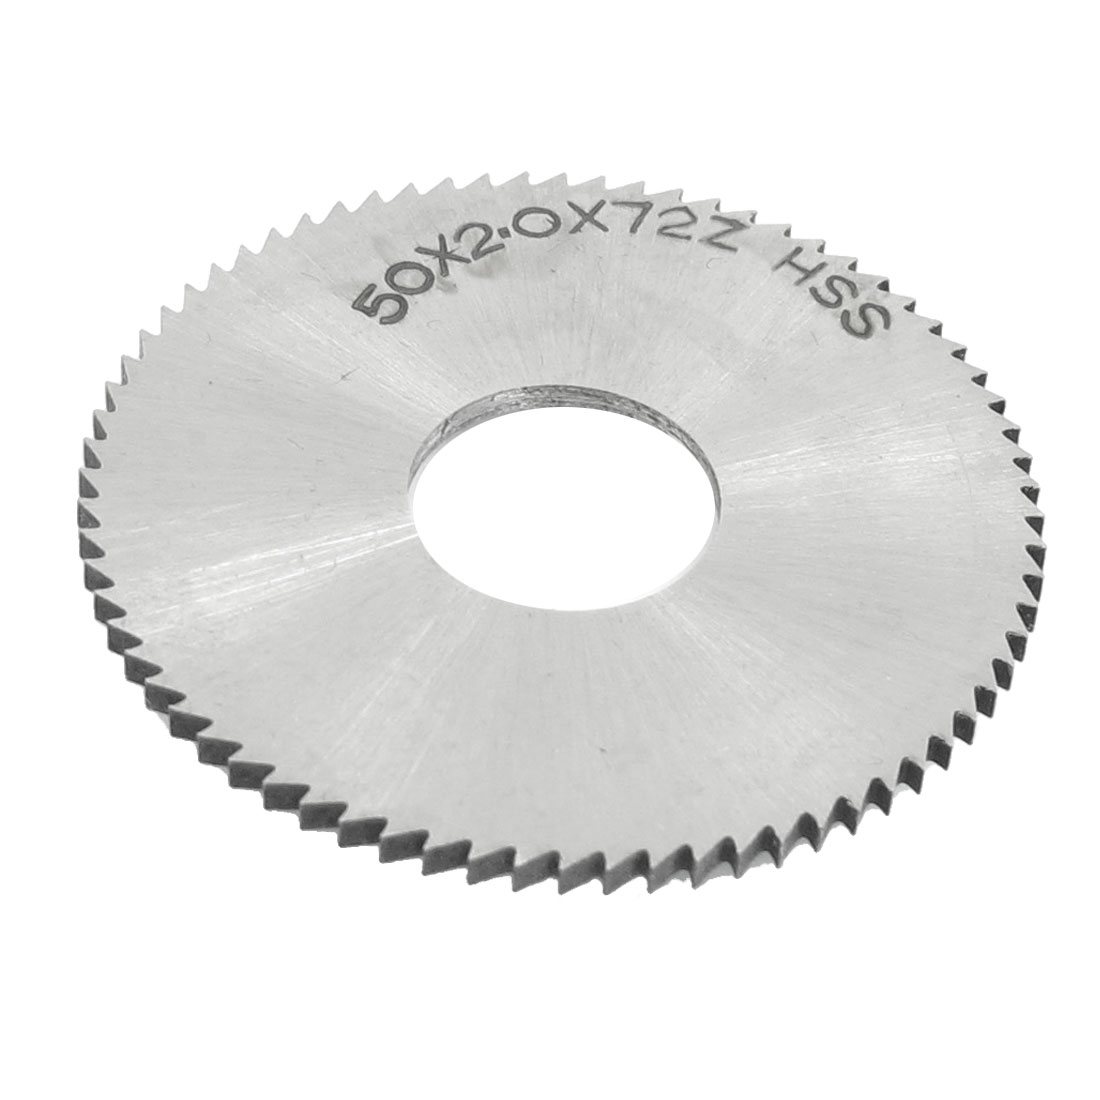 Cutting Tool 50mm x 16mm x 2mm 72 Peg Teeth HSS Slitting Saw